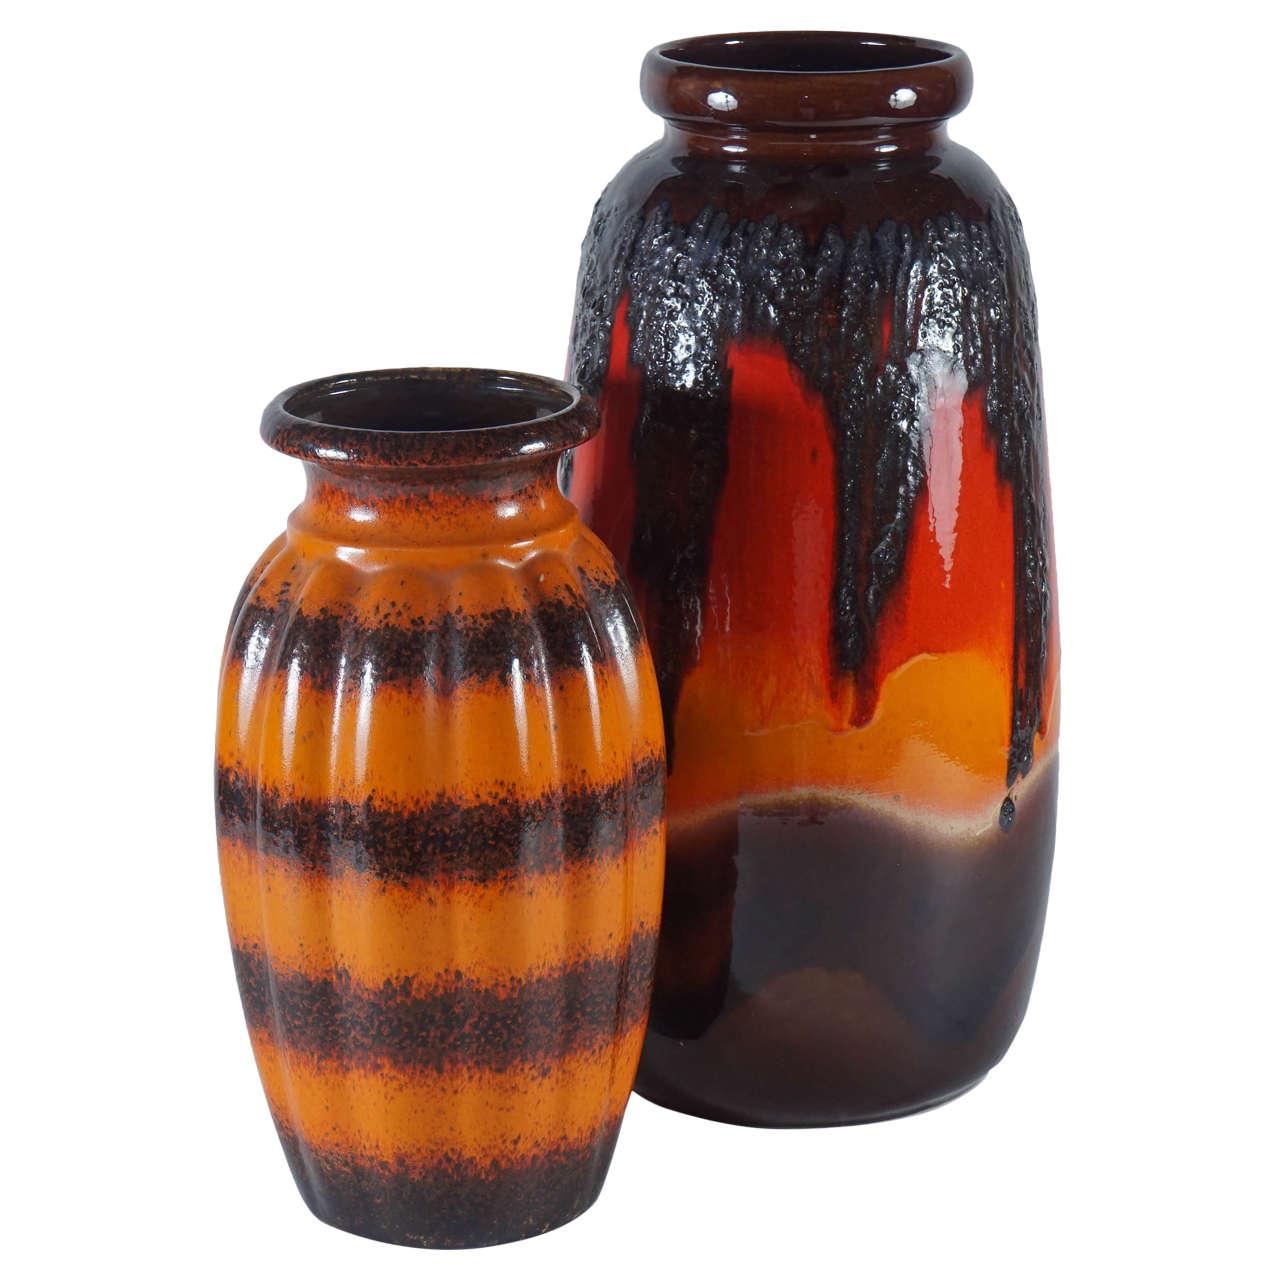 Pair of west german pottery vases in orange at 1stdibs for Orange vase